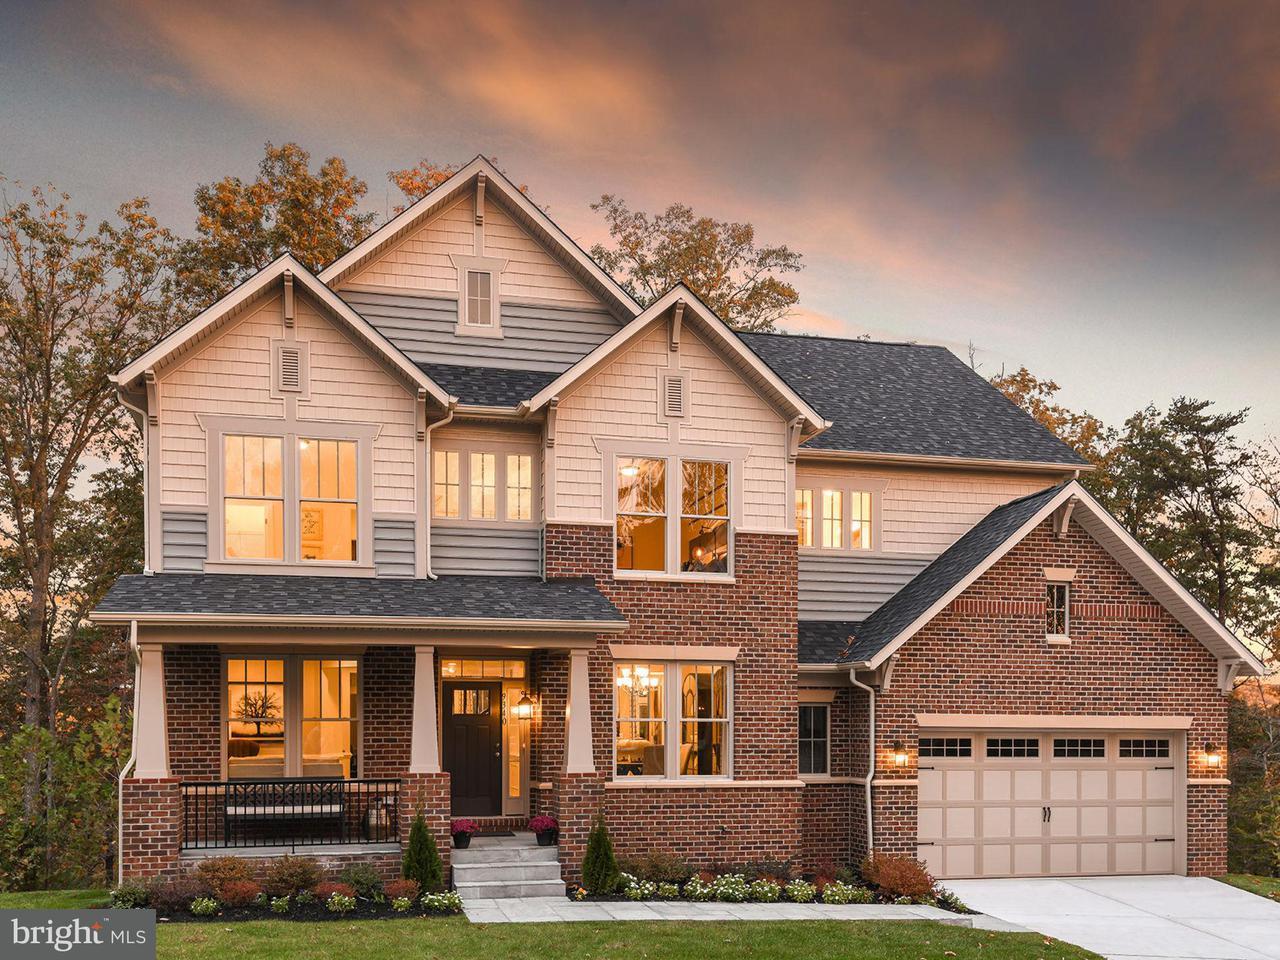 Single Family Home for Sale at 9348 RAVENRIDGE Road 9348 RAVENRIDGE Road Parkville, Maryland 21234 United States